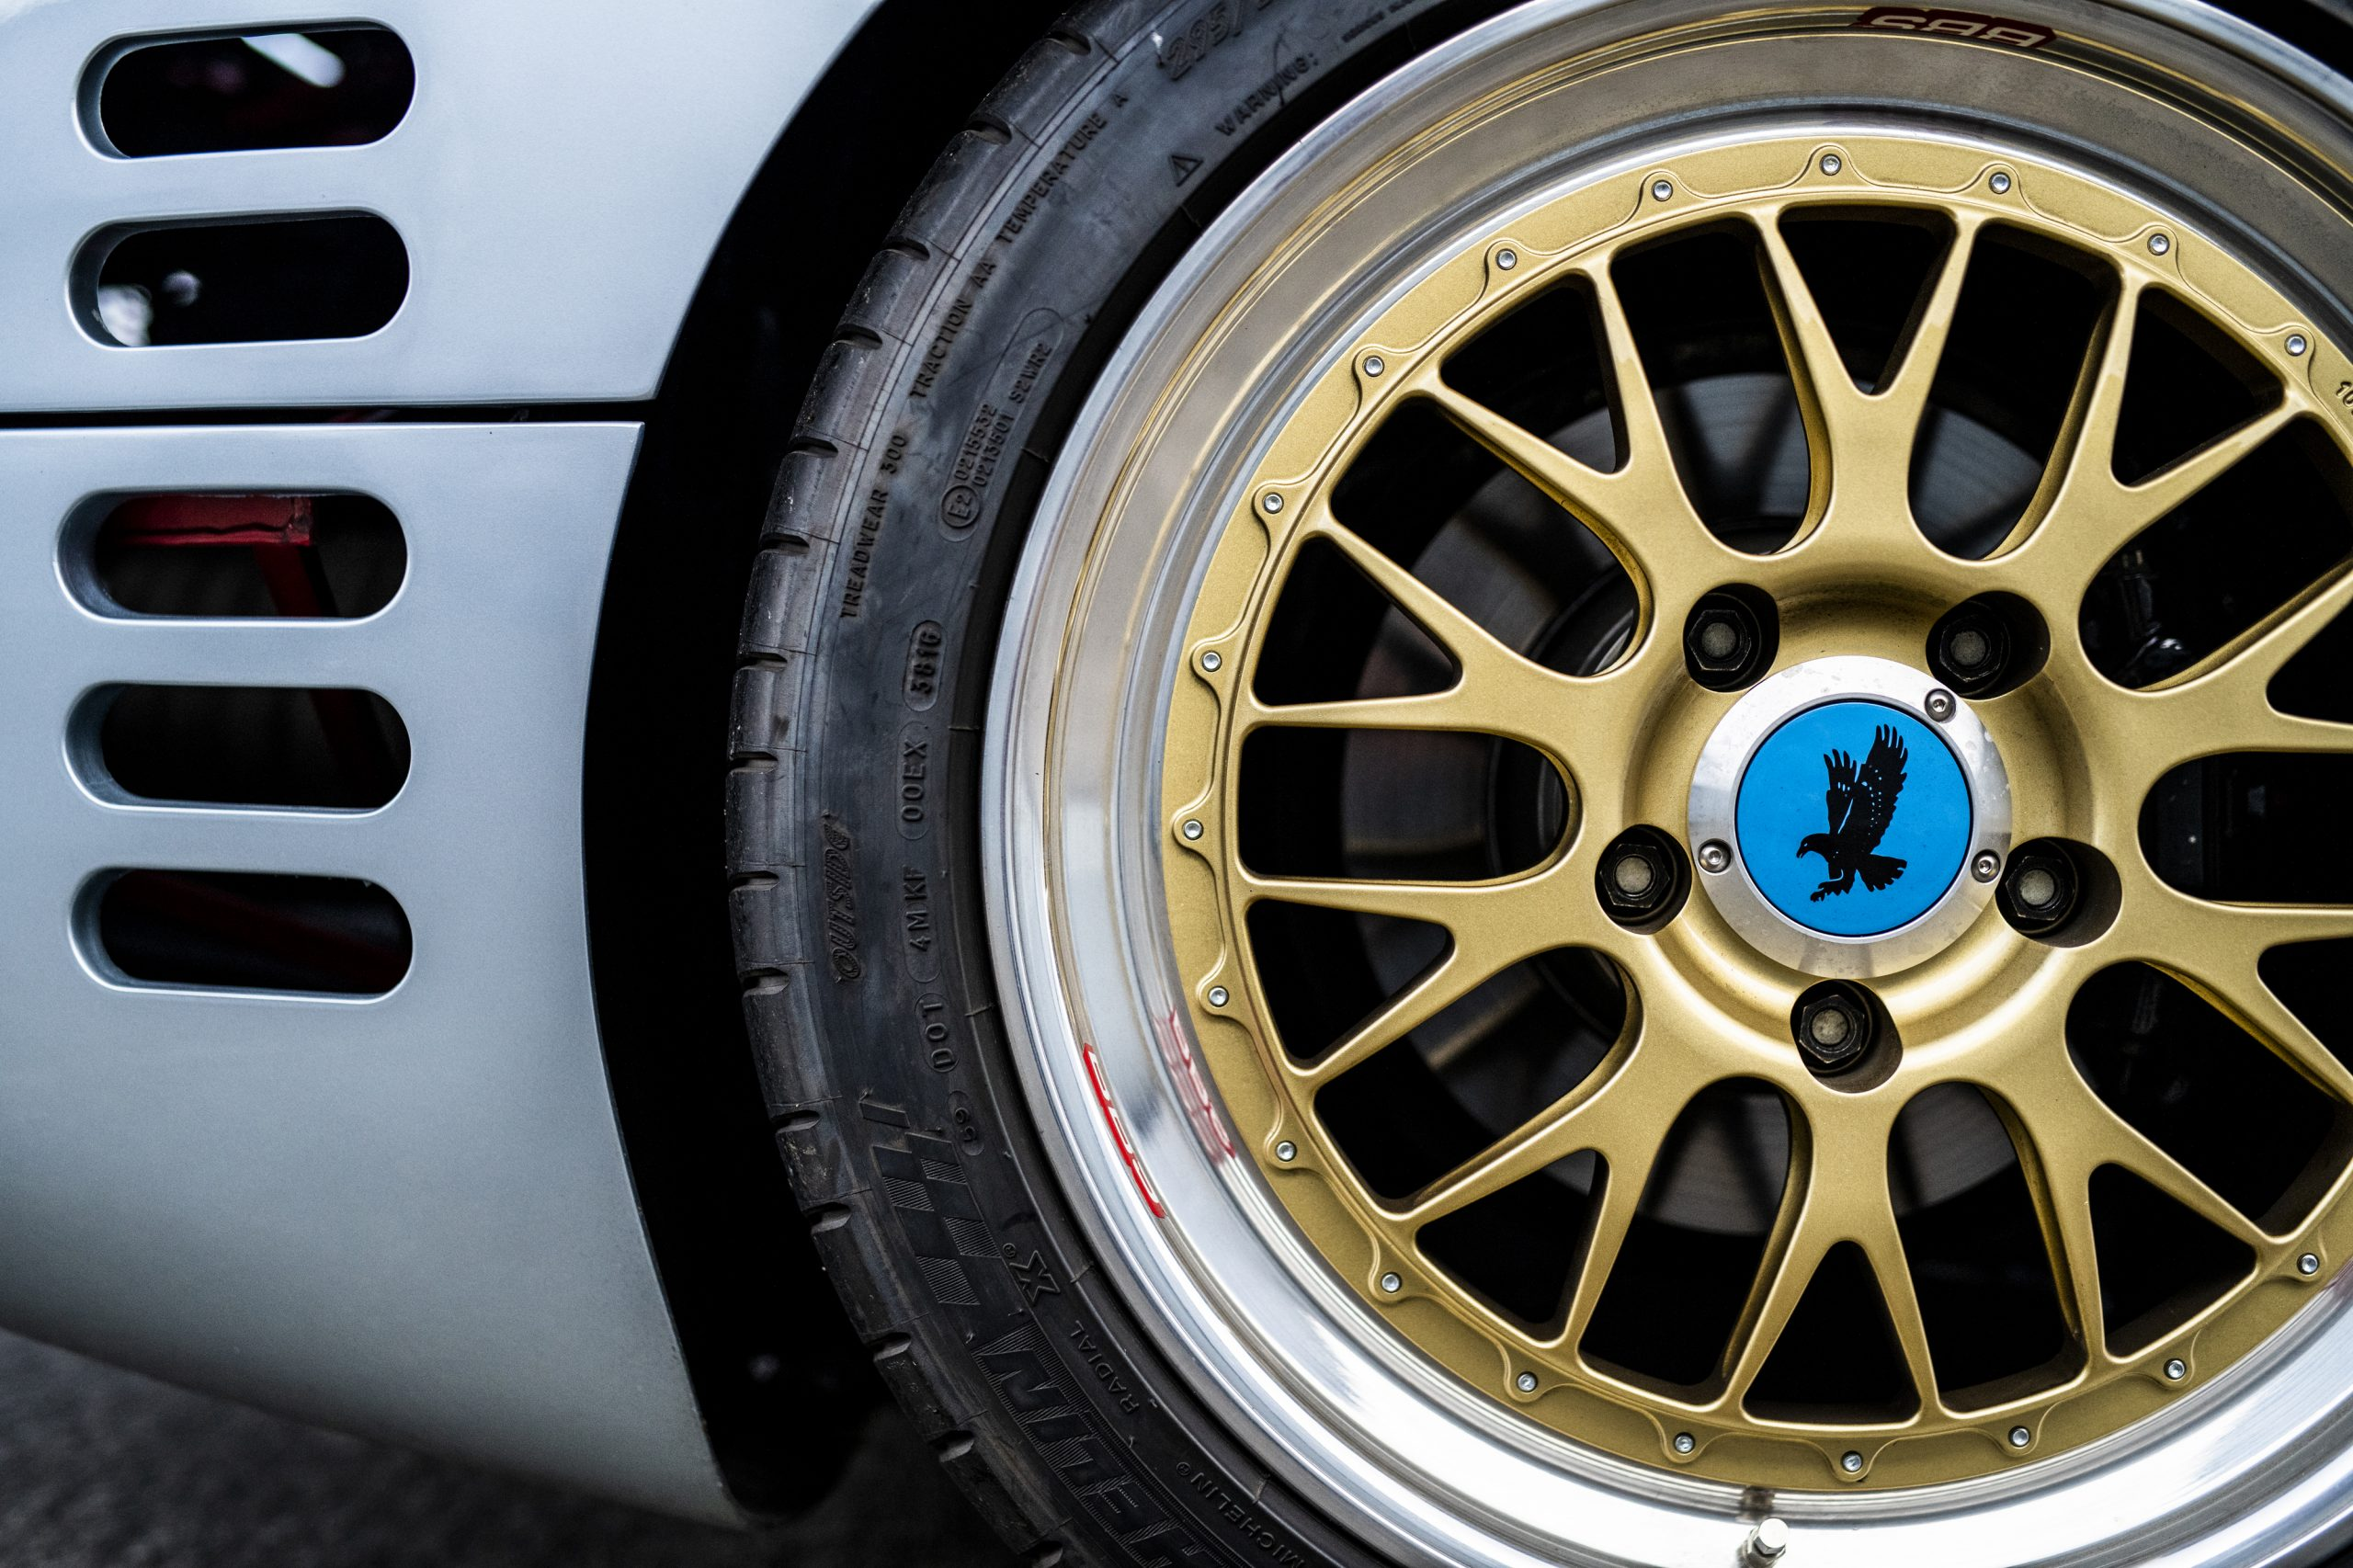 1993 Isdera Commendatore 112i wheel tire close up detail